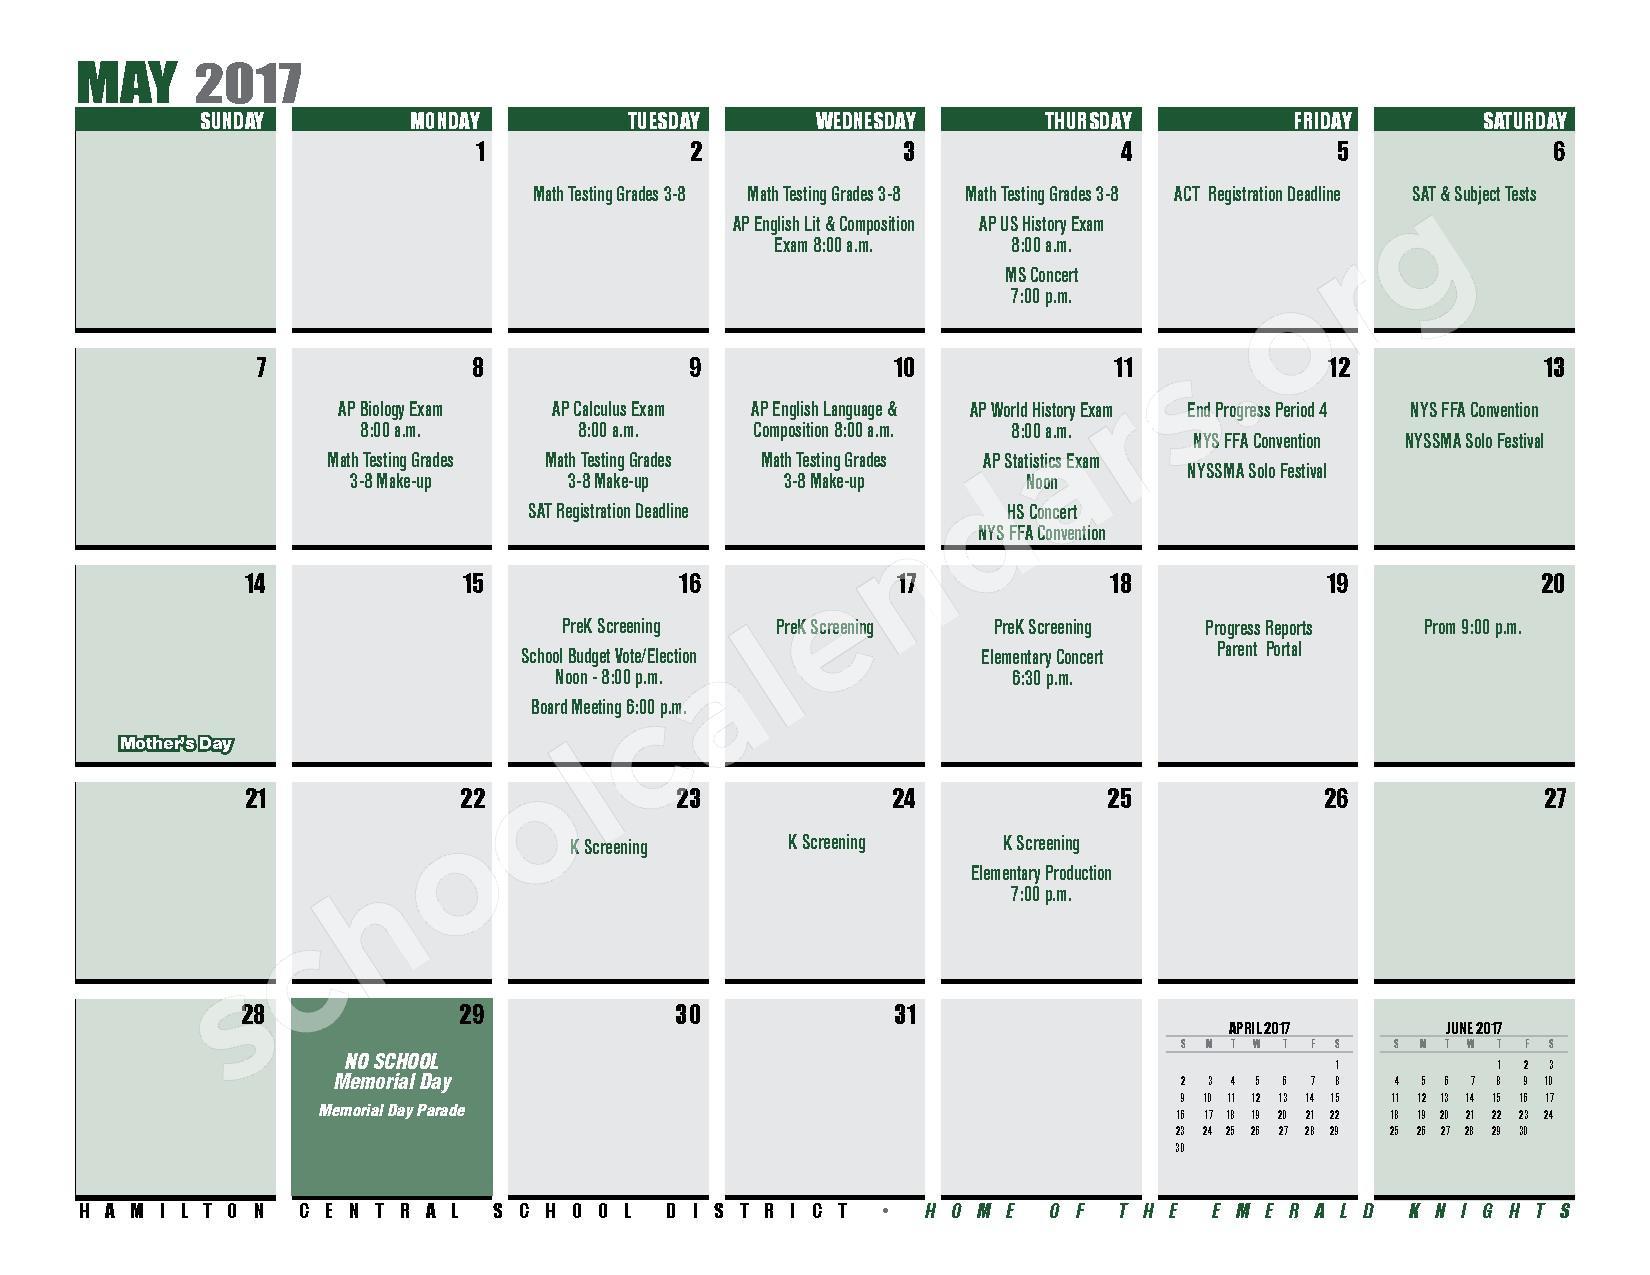 2016 - 2017 District Calendar – Hamilton Central School District – page 25